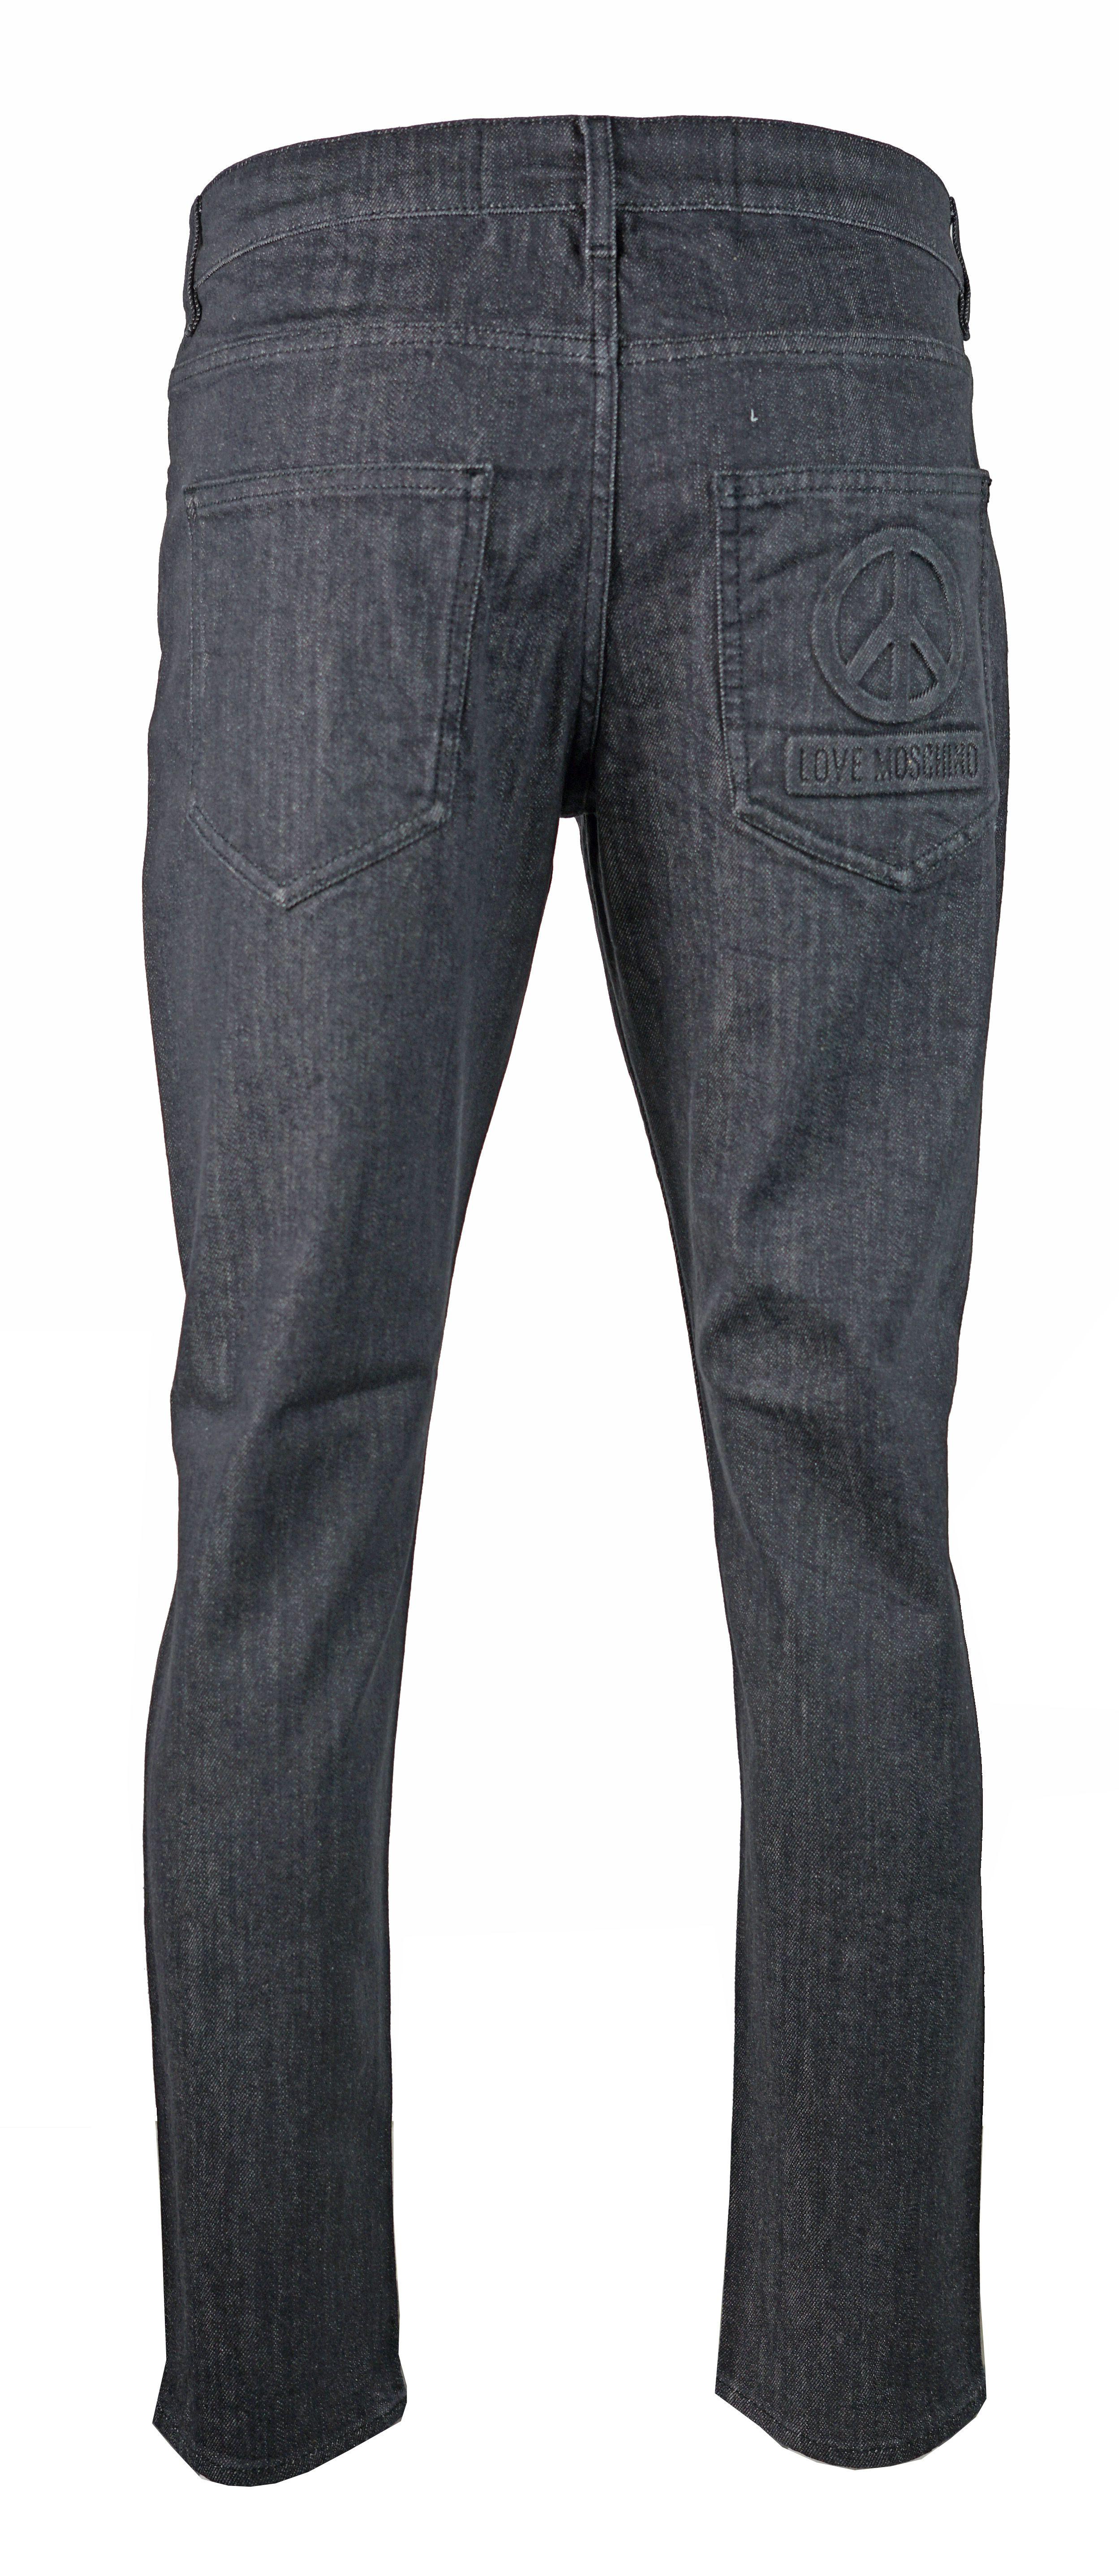 Love Moschino M Q 427 18 S 2990 018E Black Jeans